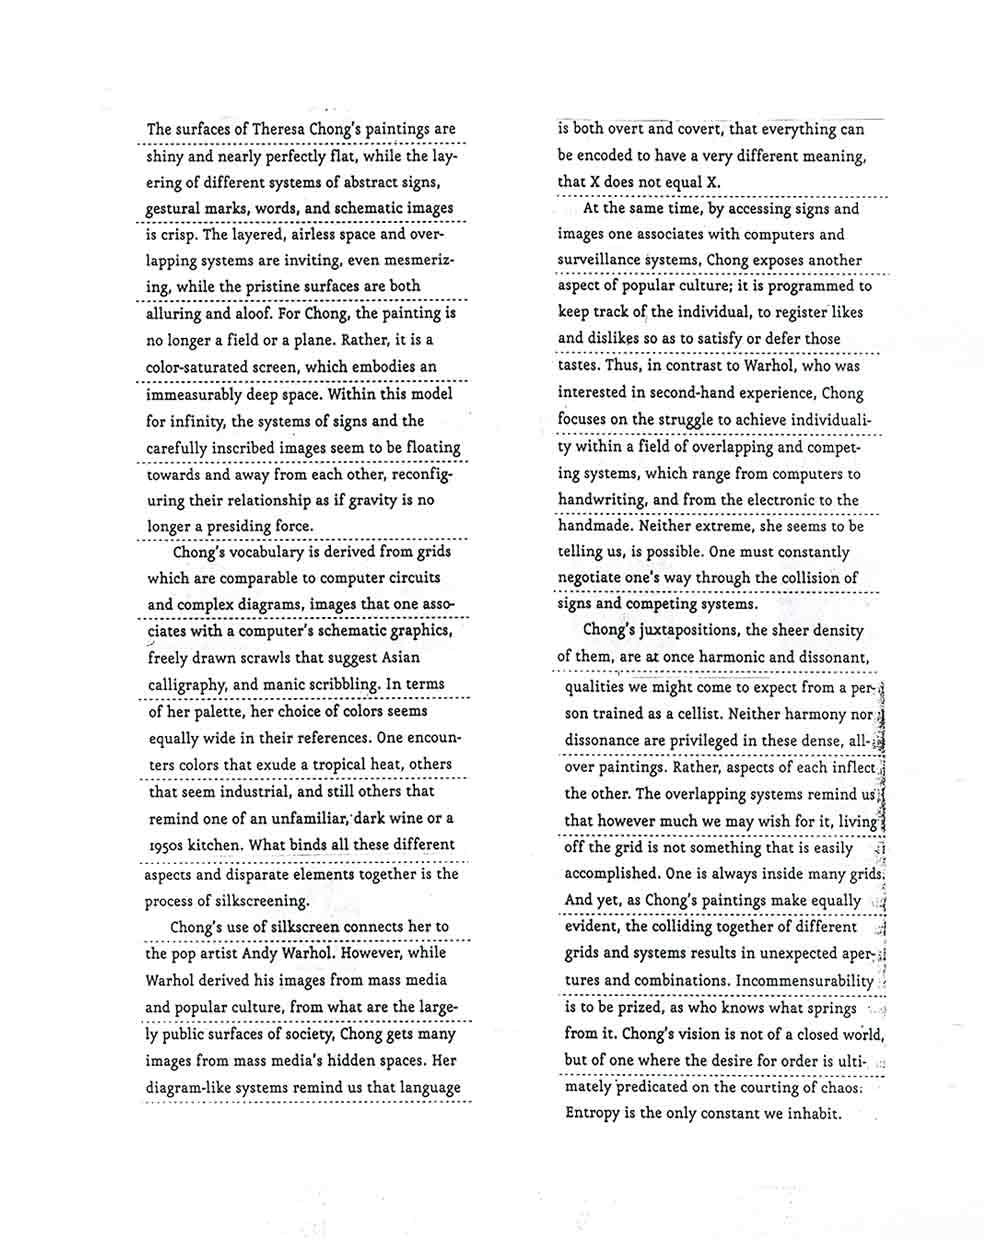 Introduction by John Yau, pg 2